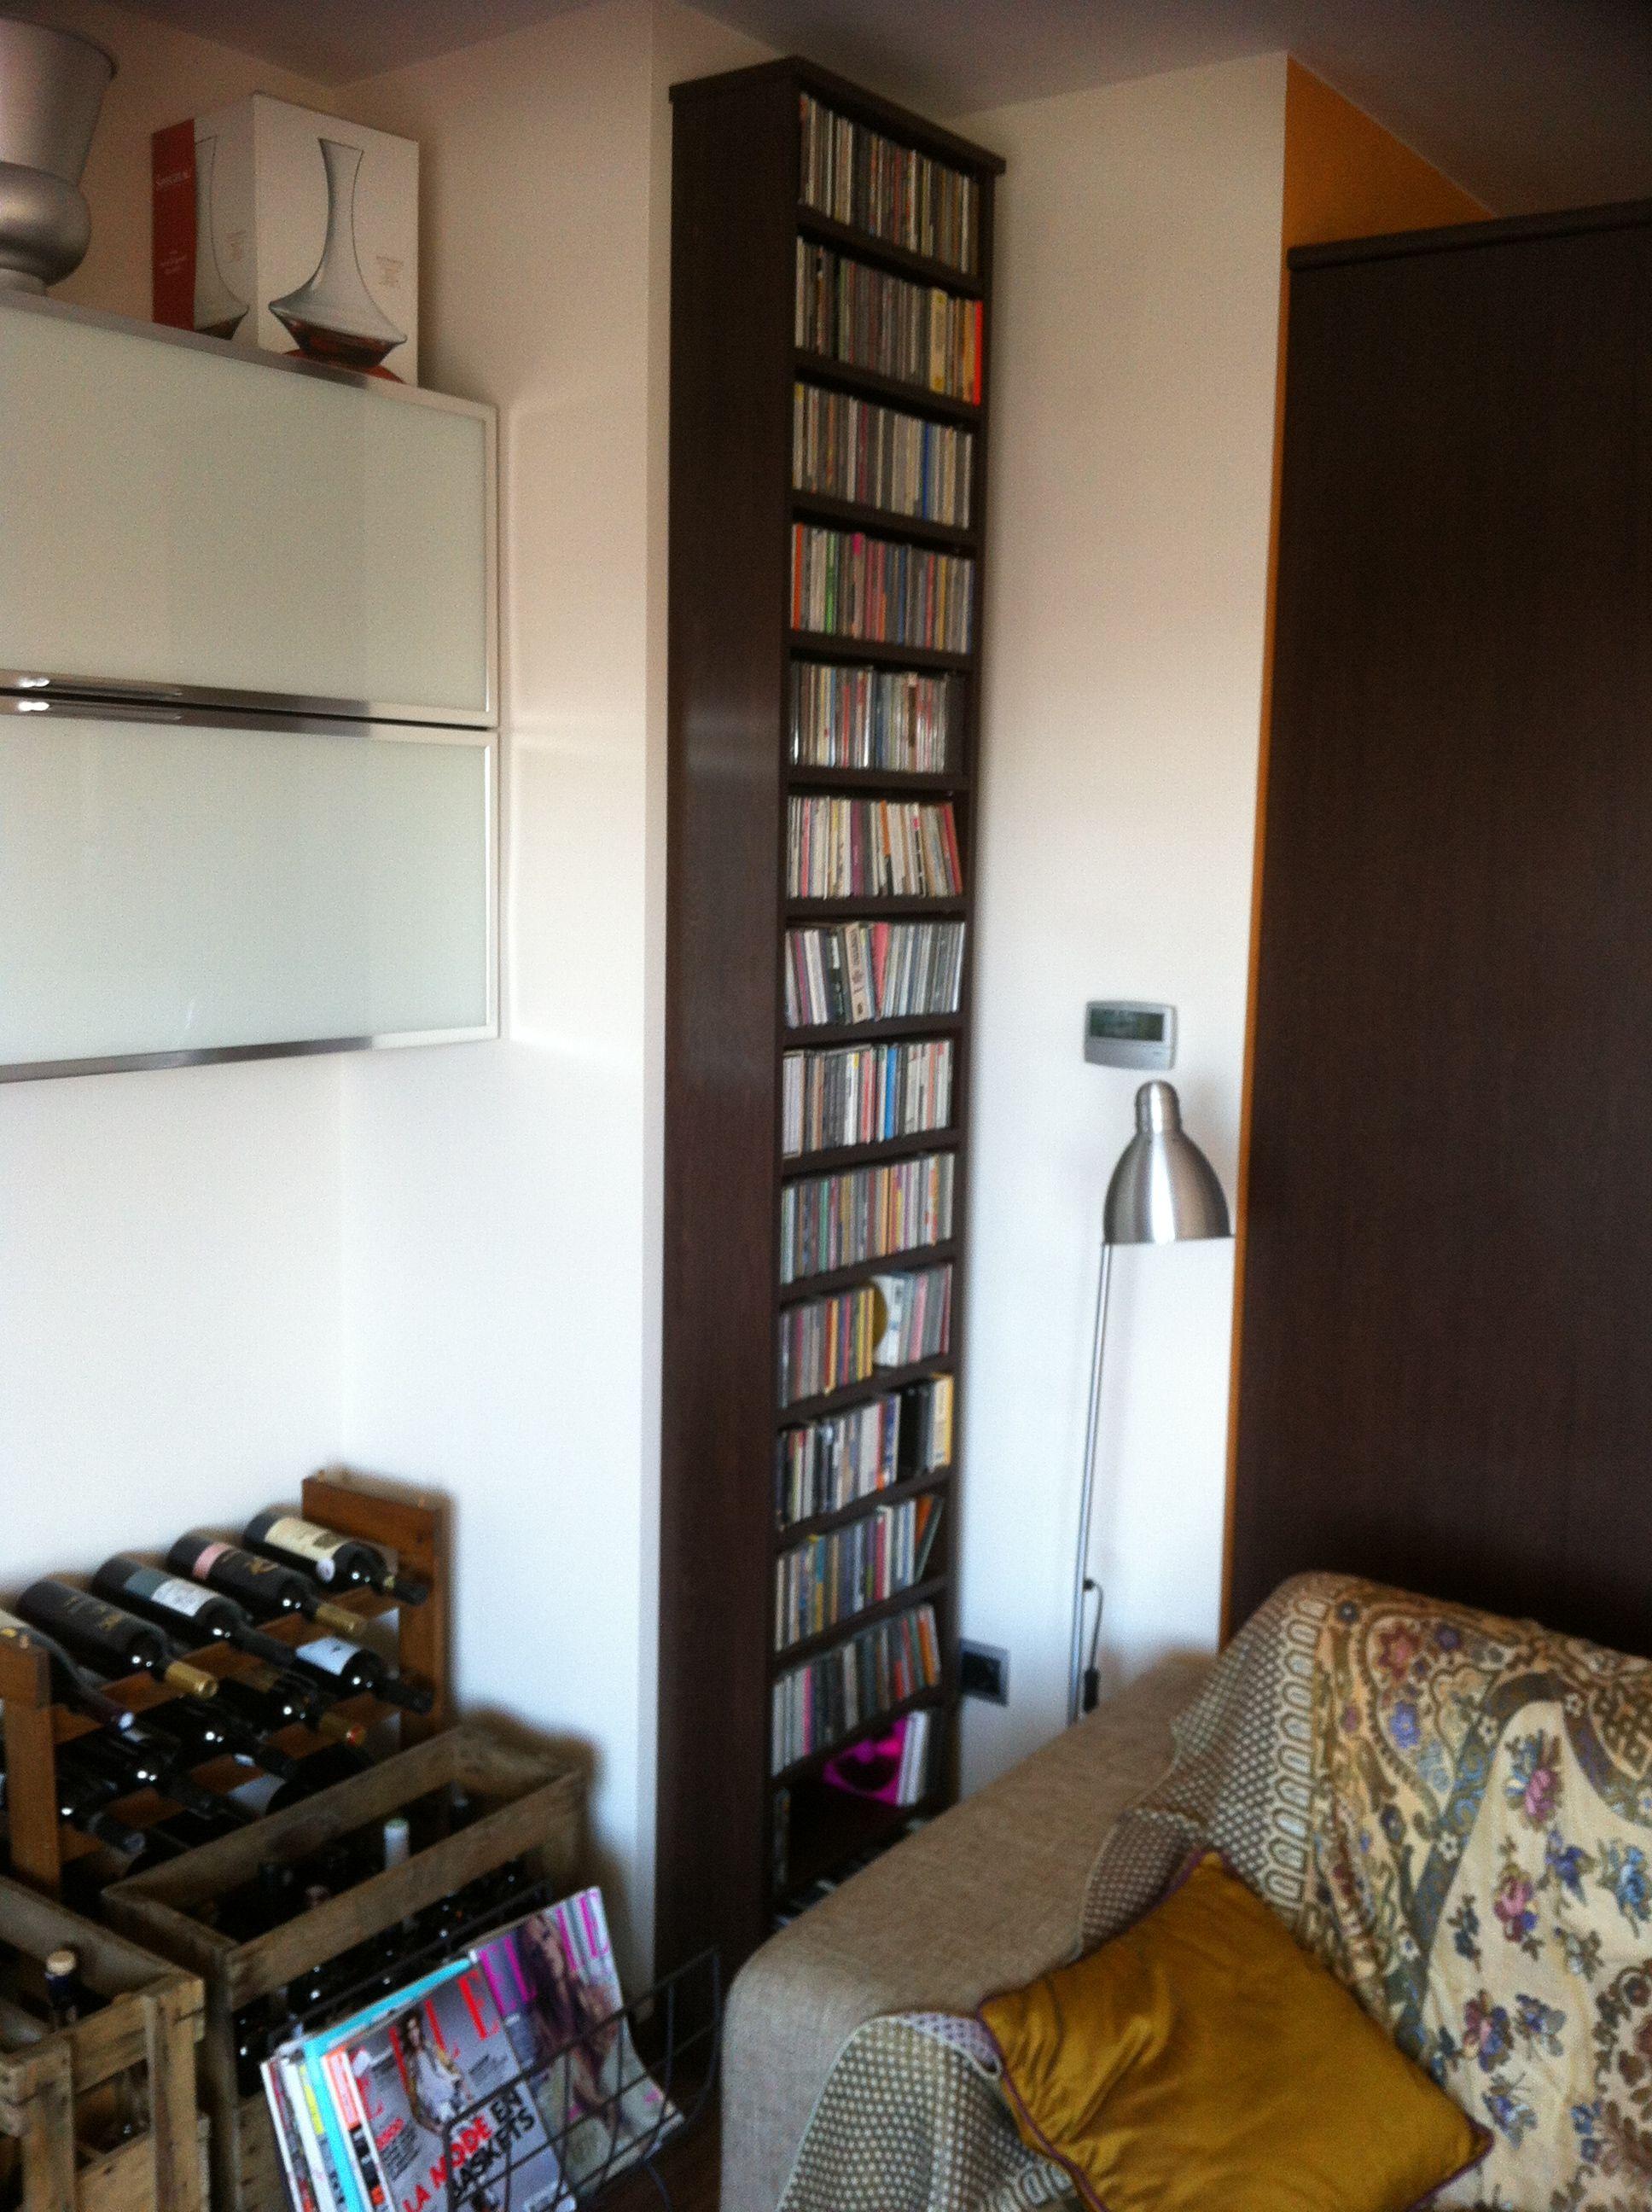 cds furniture. Cds Furniture. Mueble Para Cds,dvds. Estantería Graduable. Furniture I